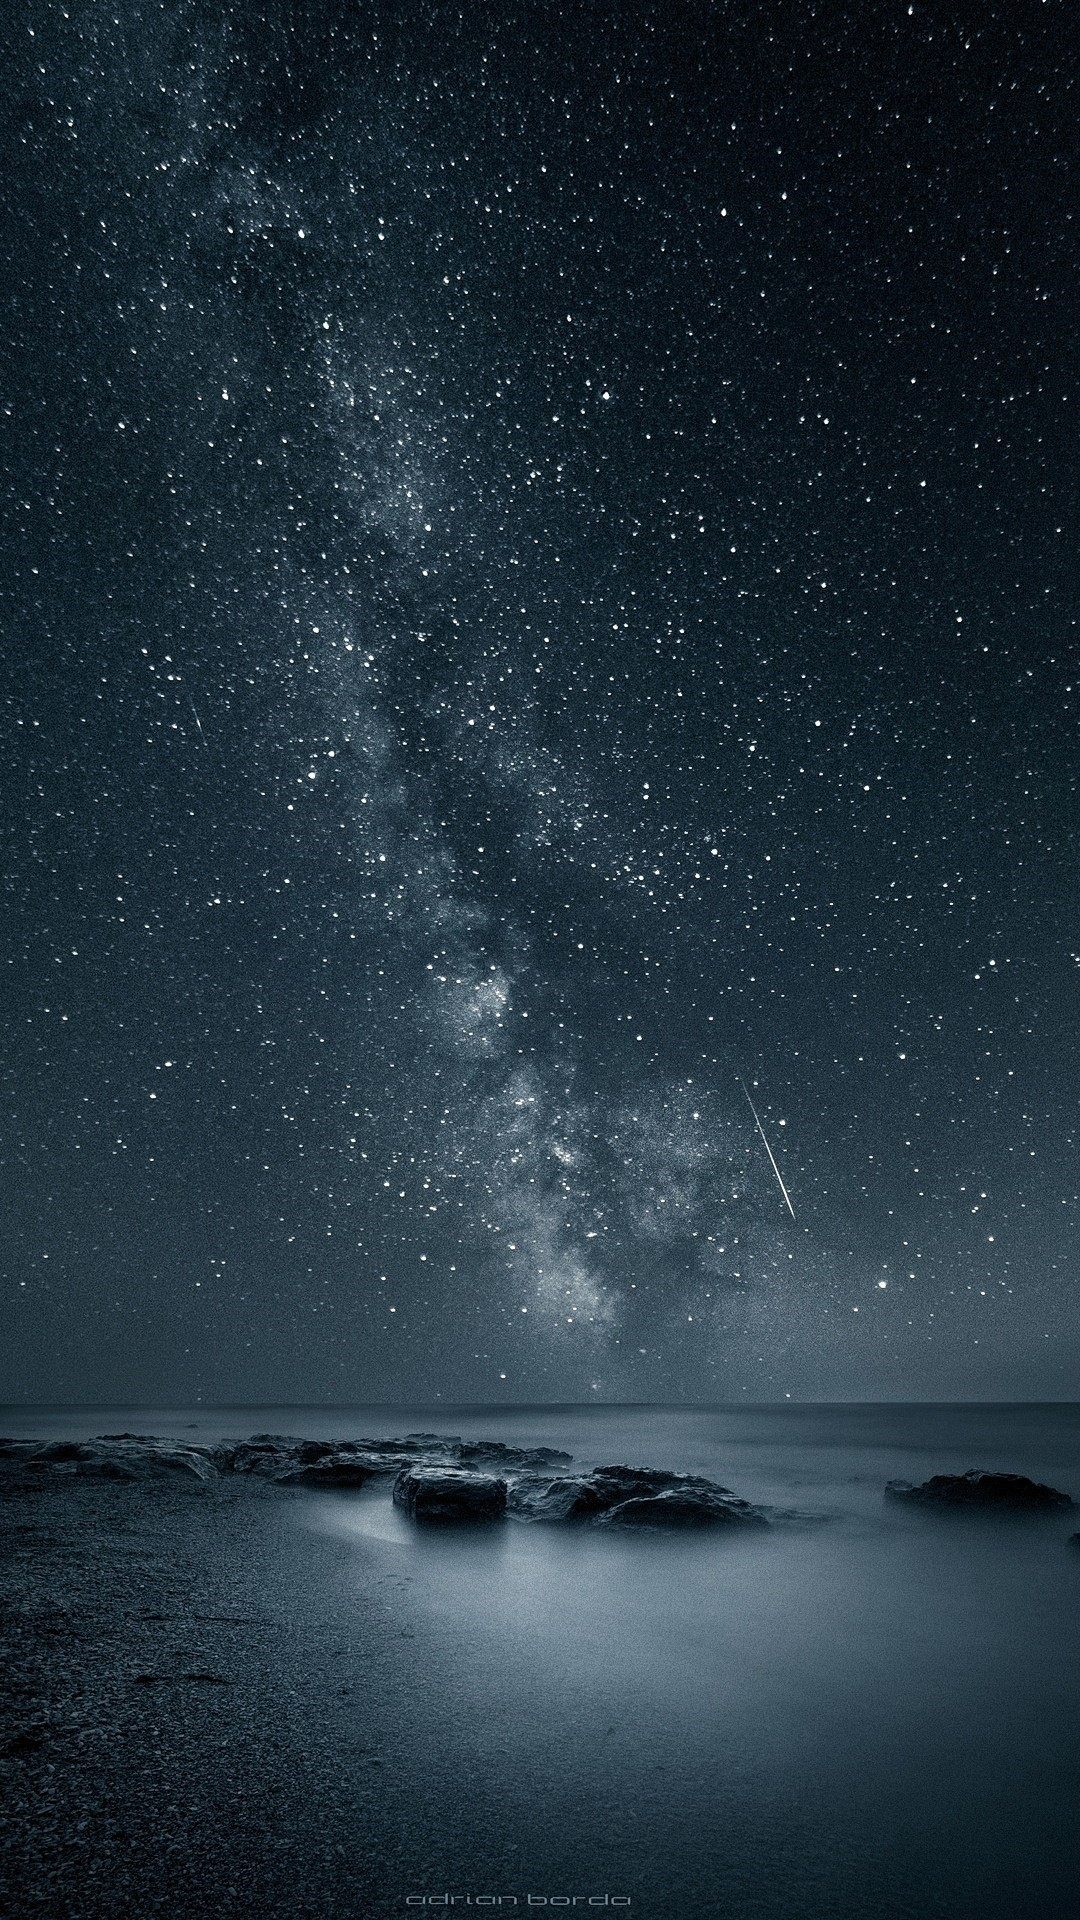 Sky screensaver wallpaper